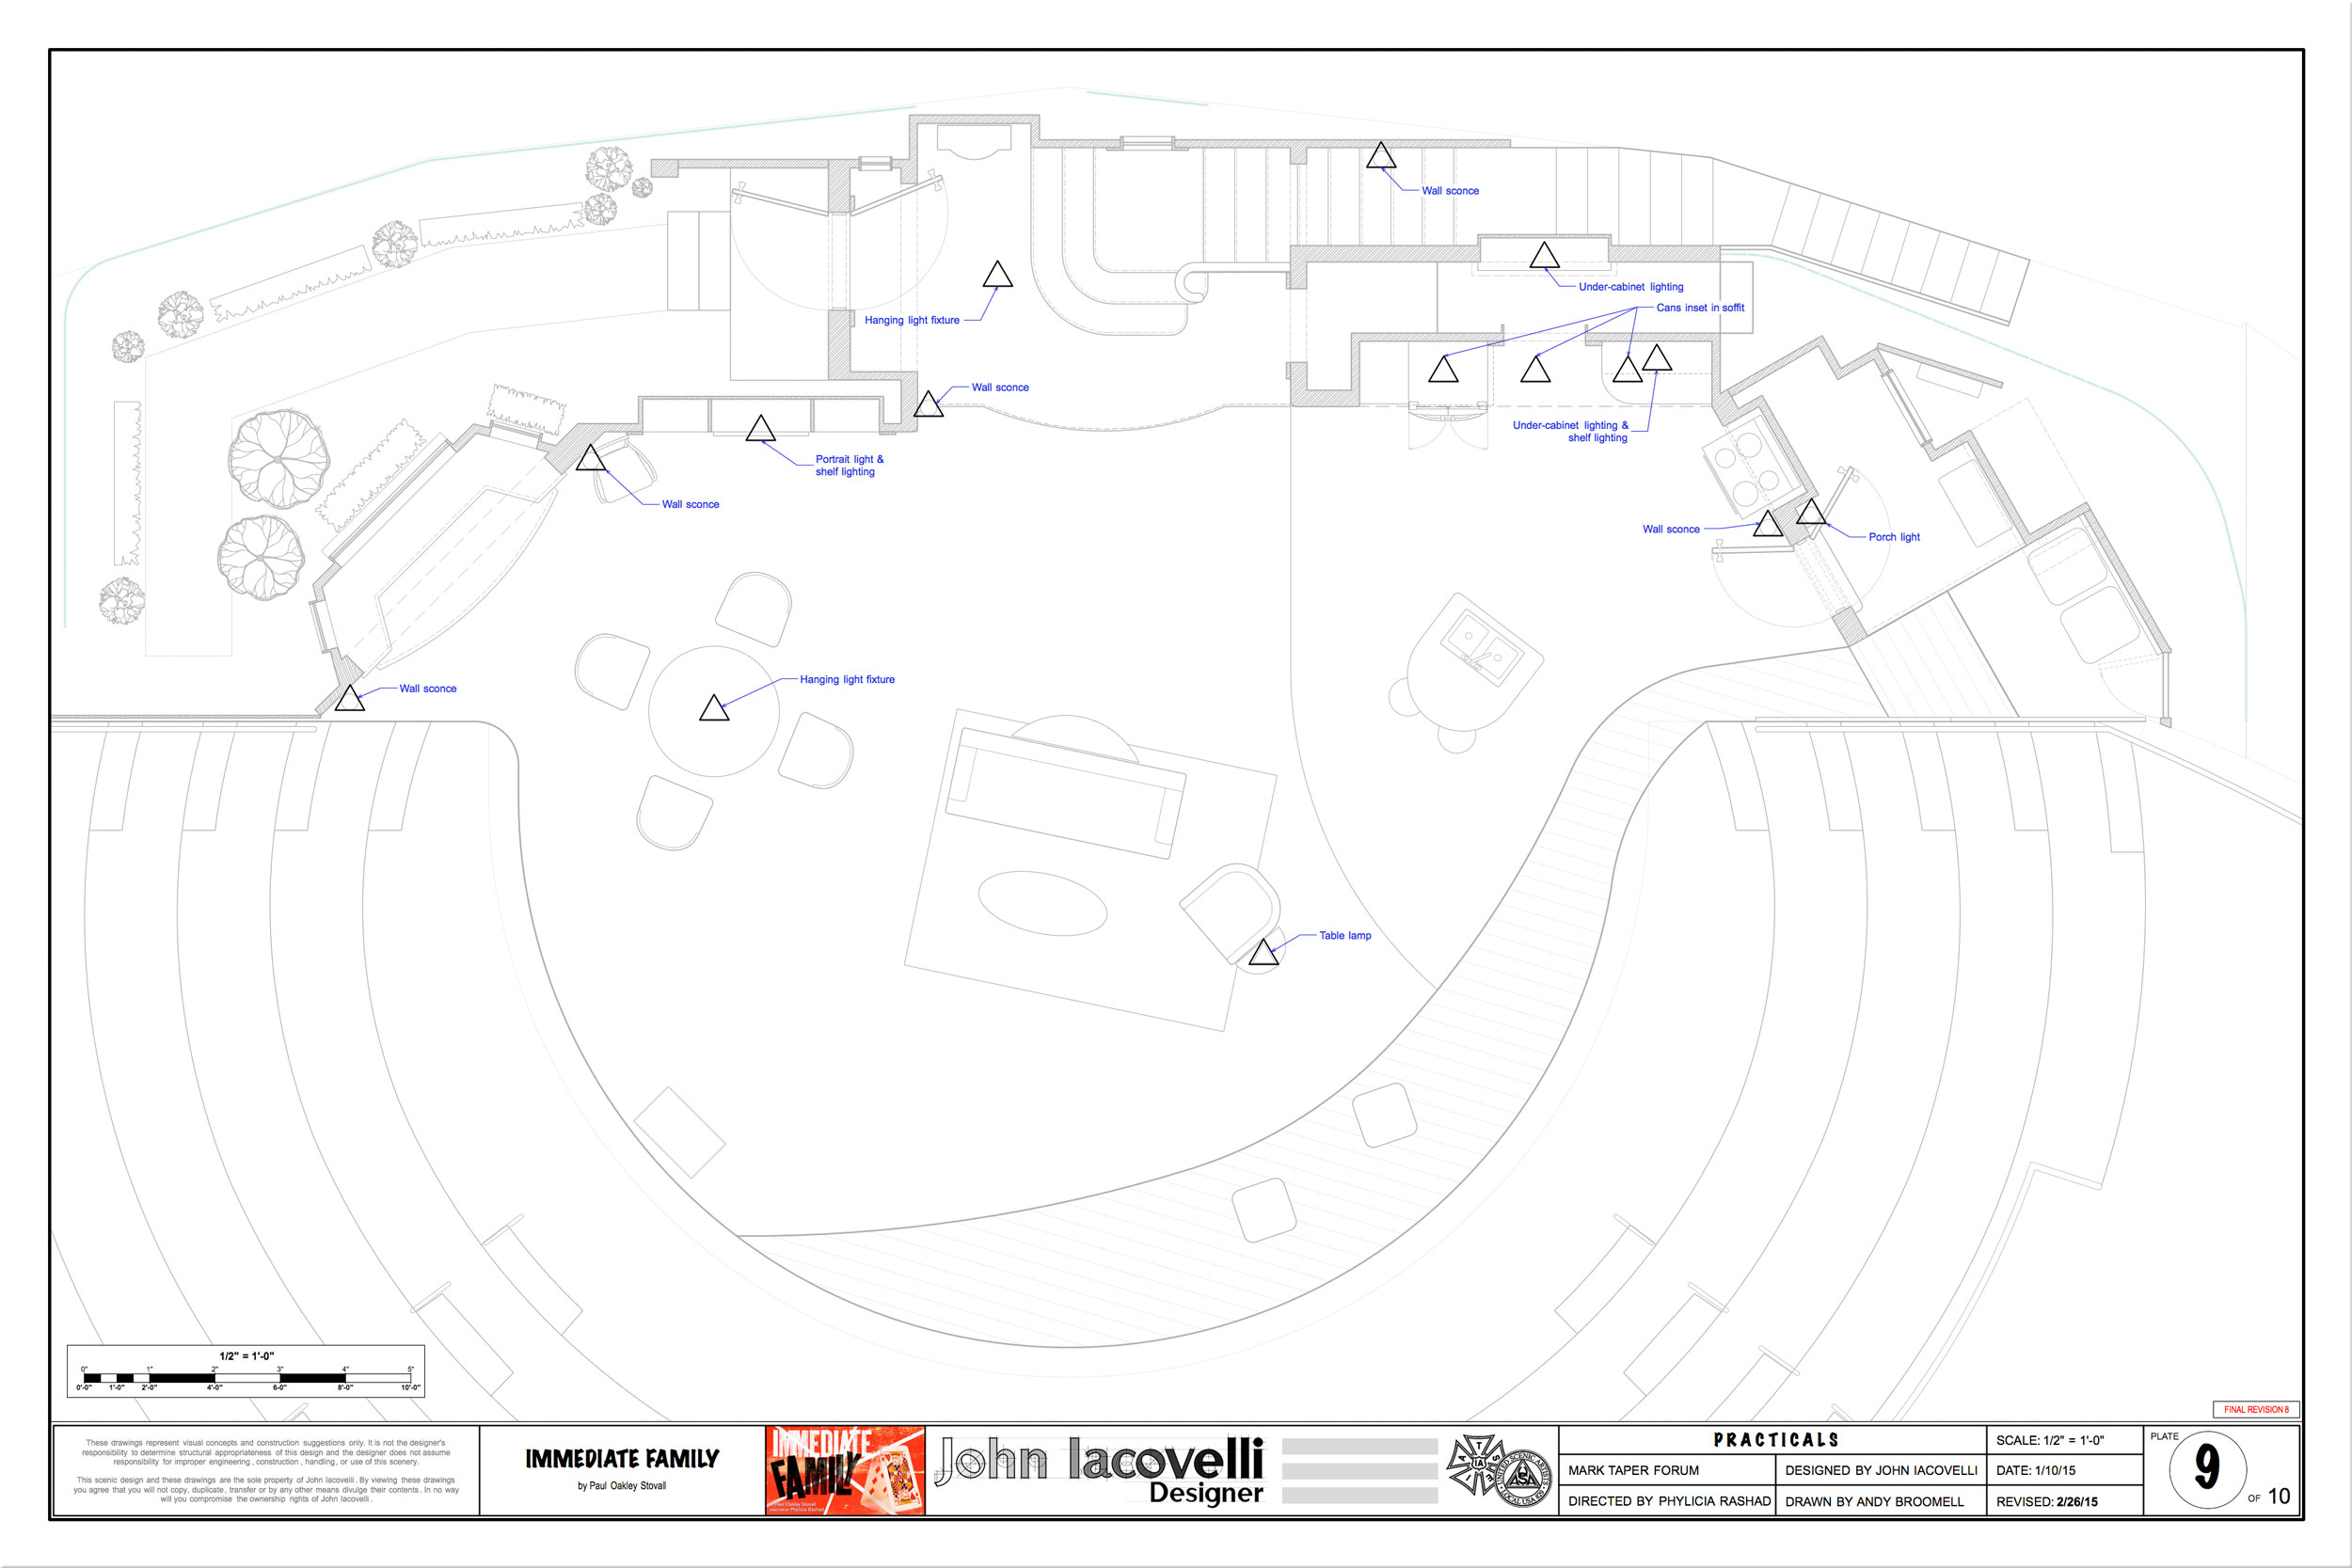 andy-broomell-scenic-design-drafting-immediate-family-9-vectorworks.jpg